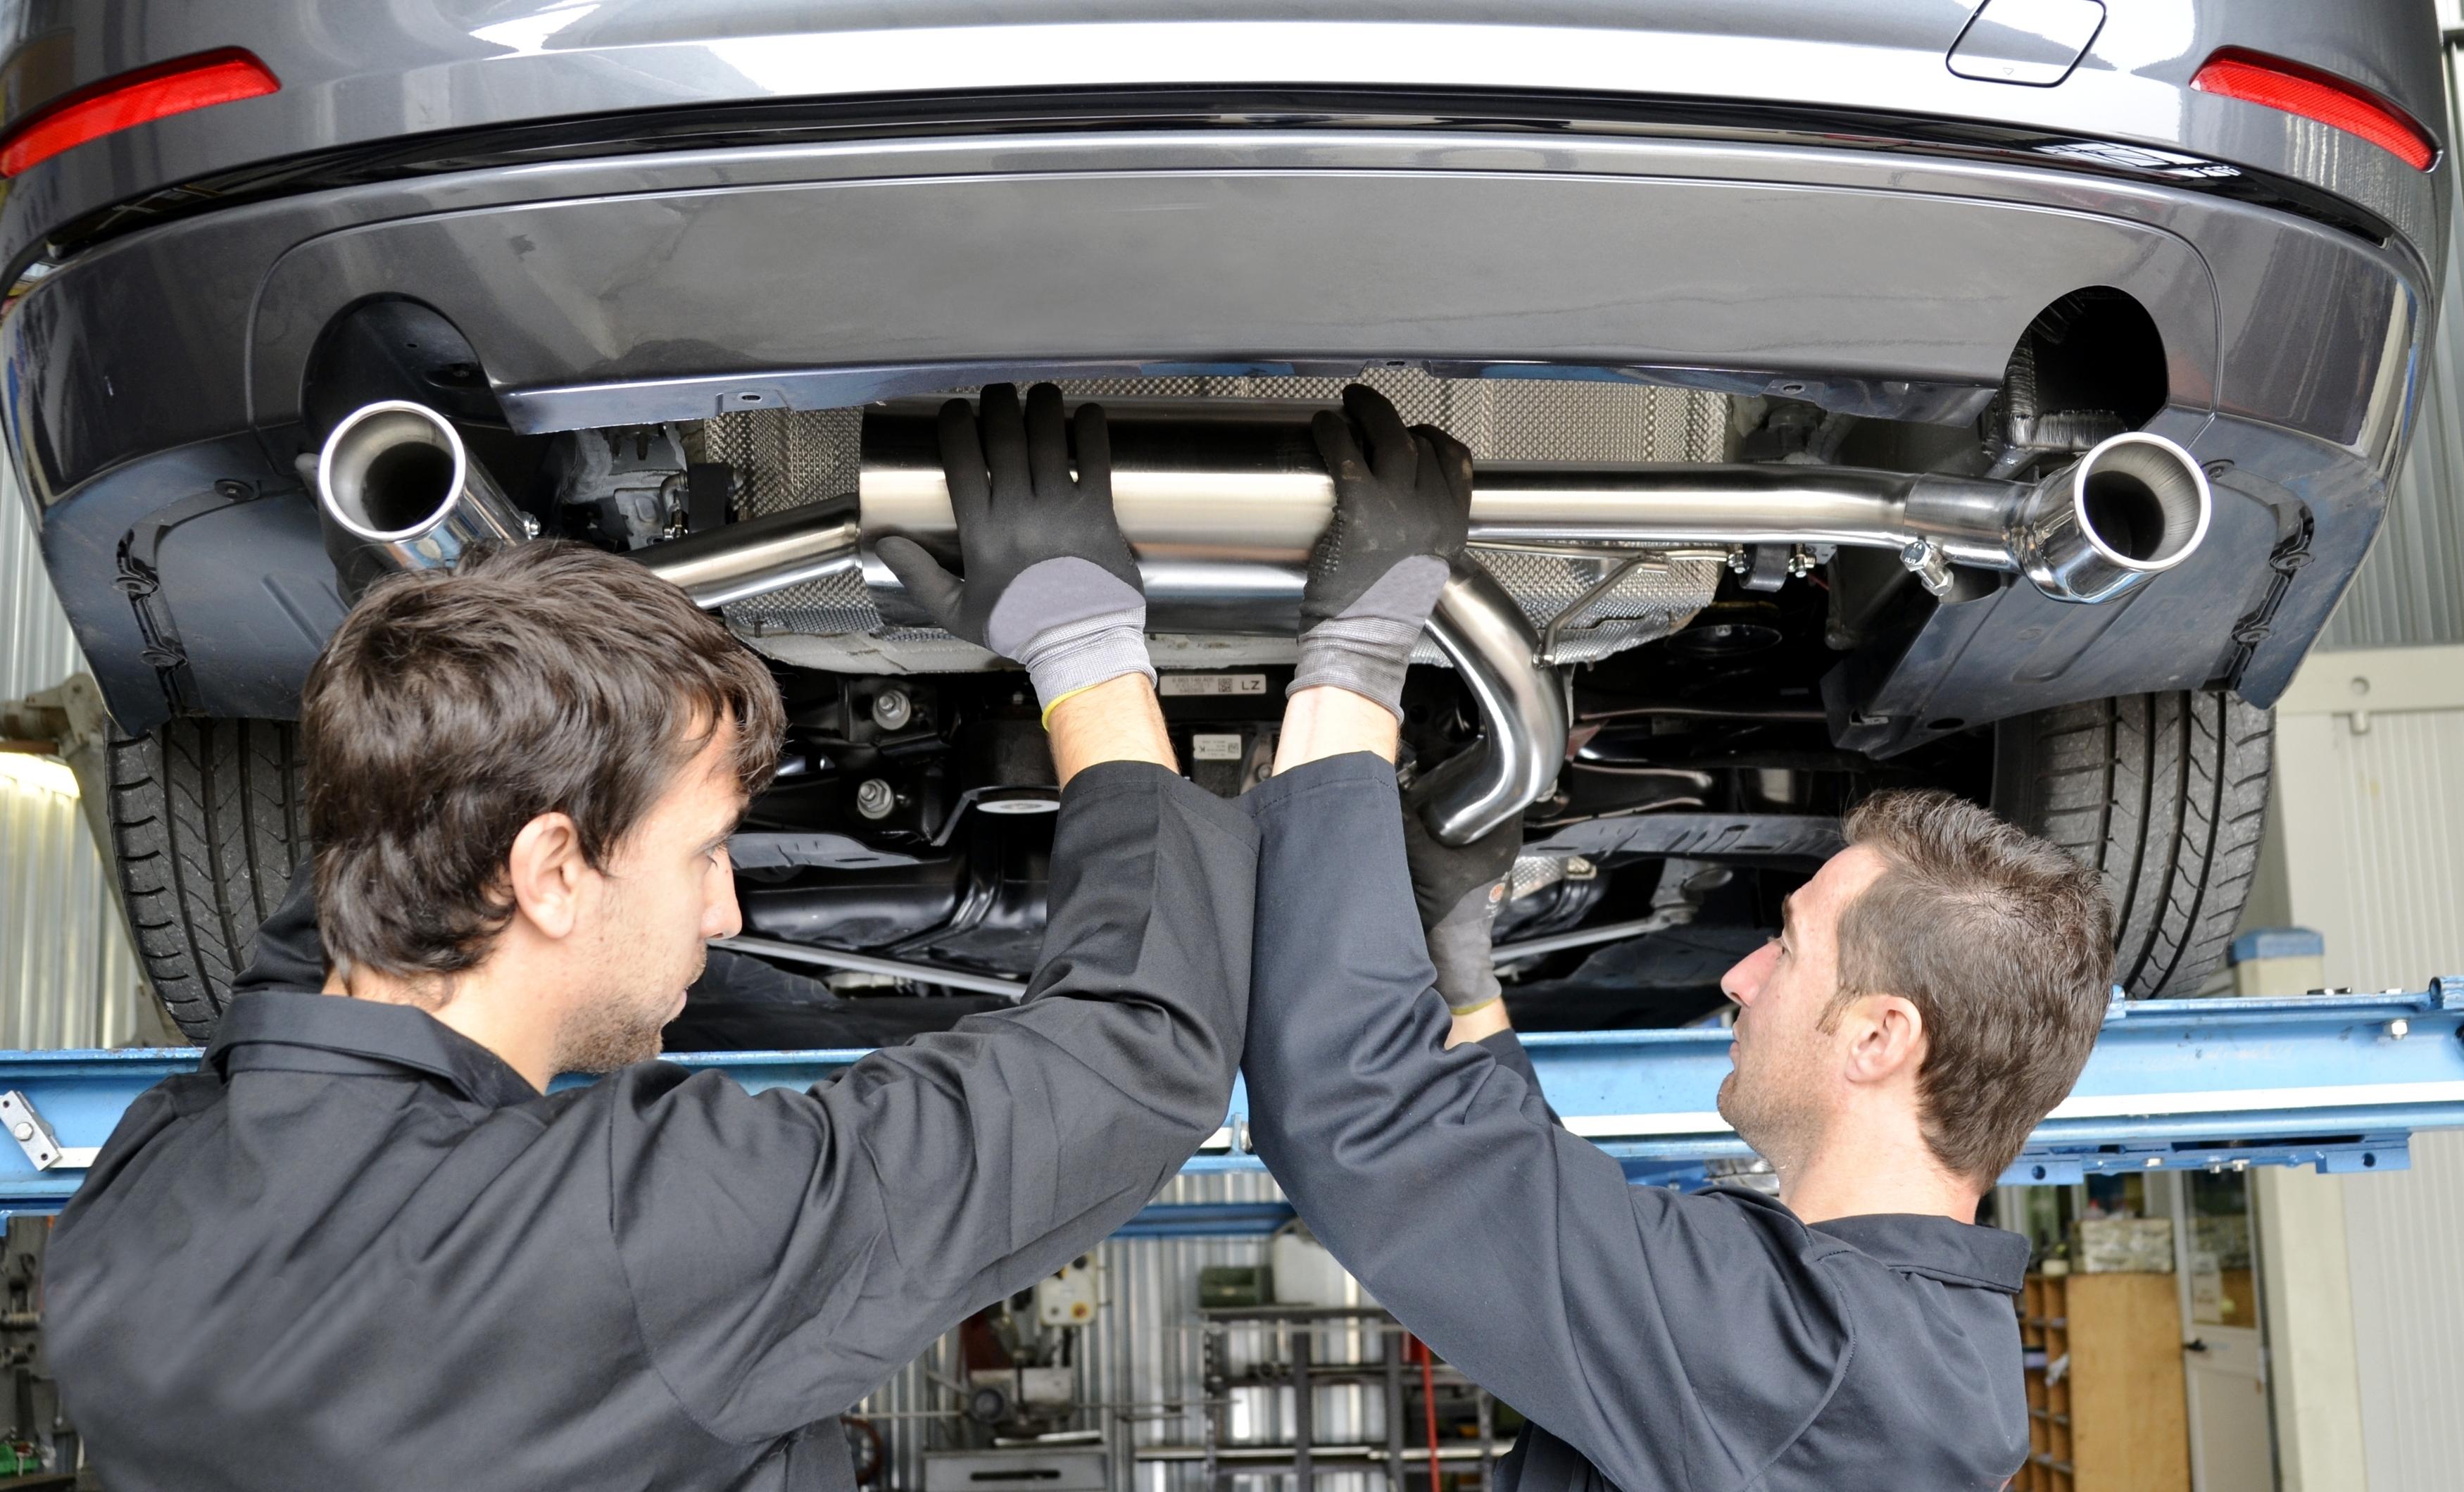 国産車/輸入車 マフラー交換費用